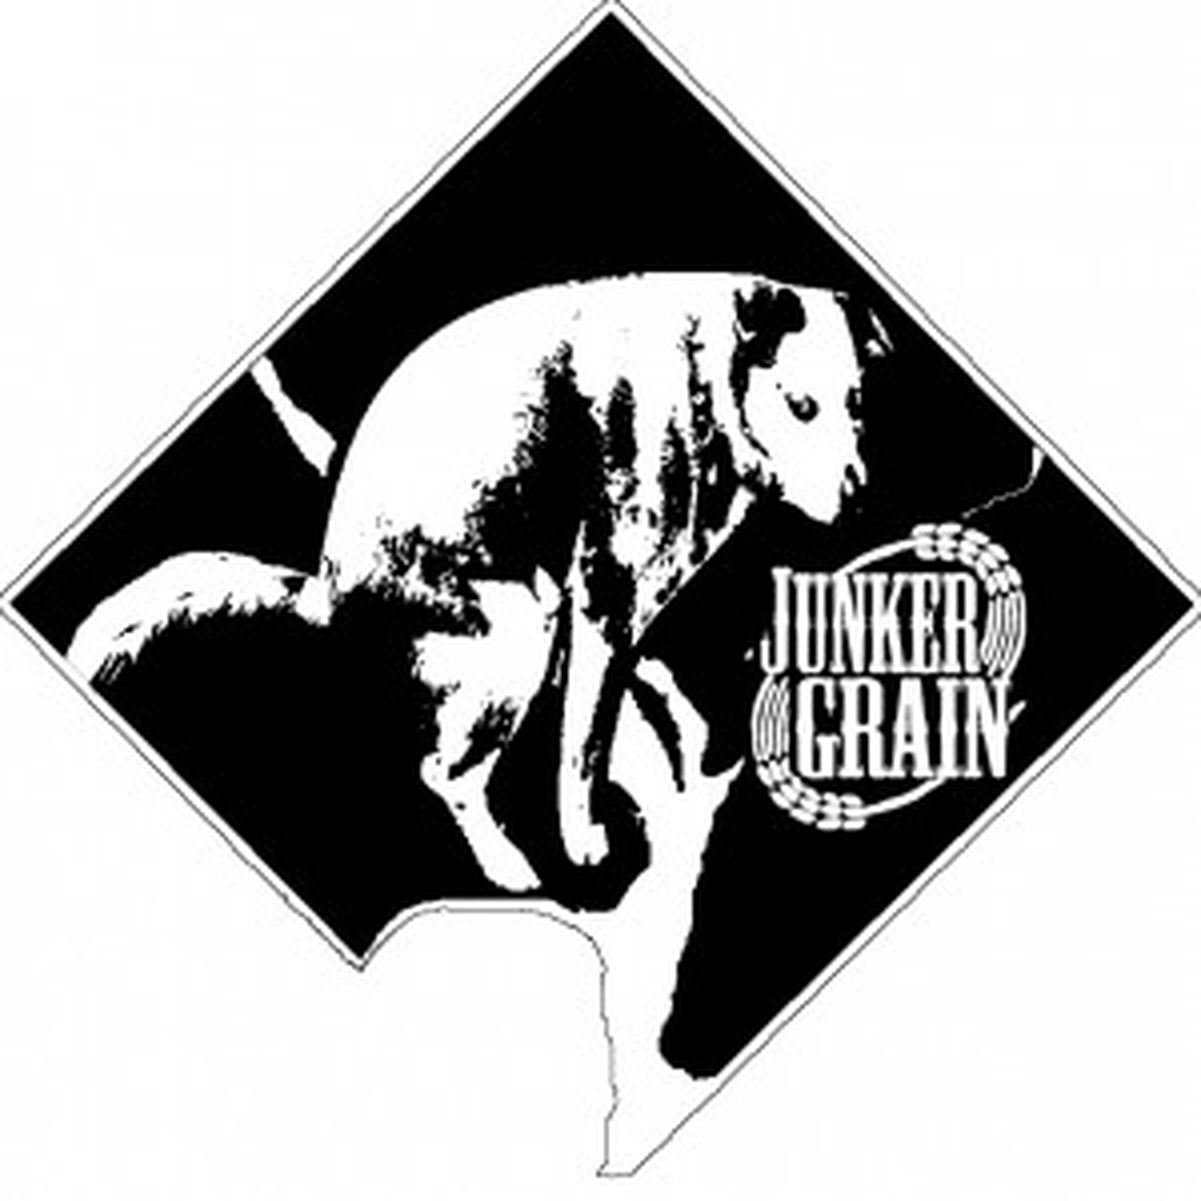 Junker Grain